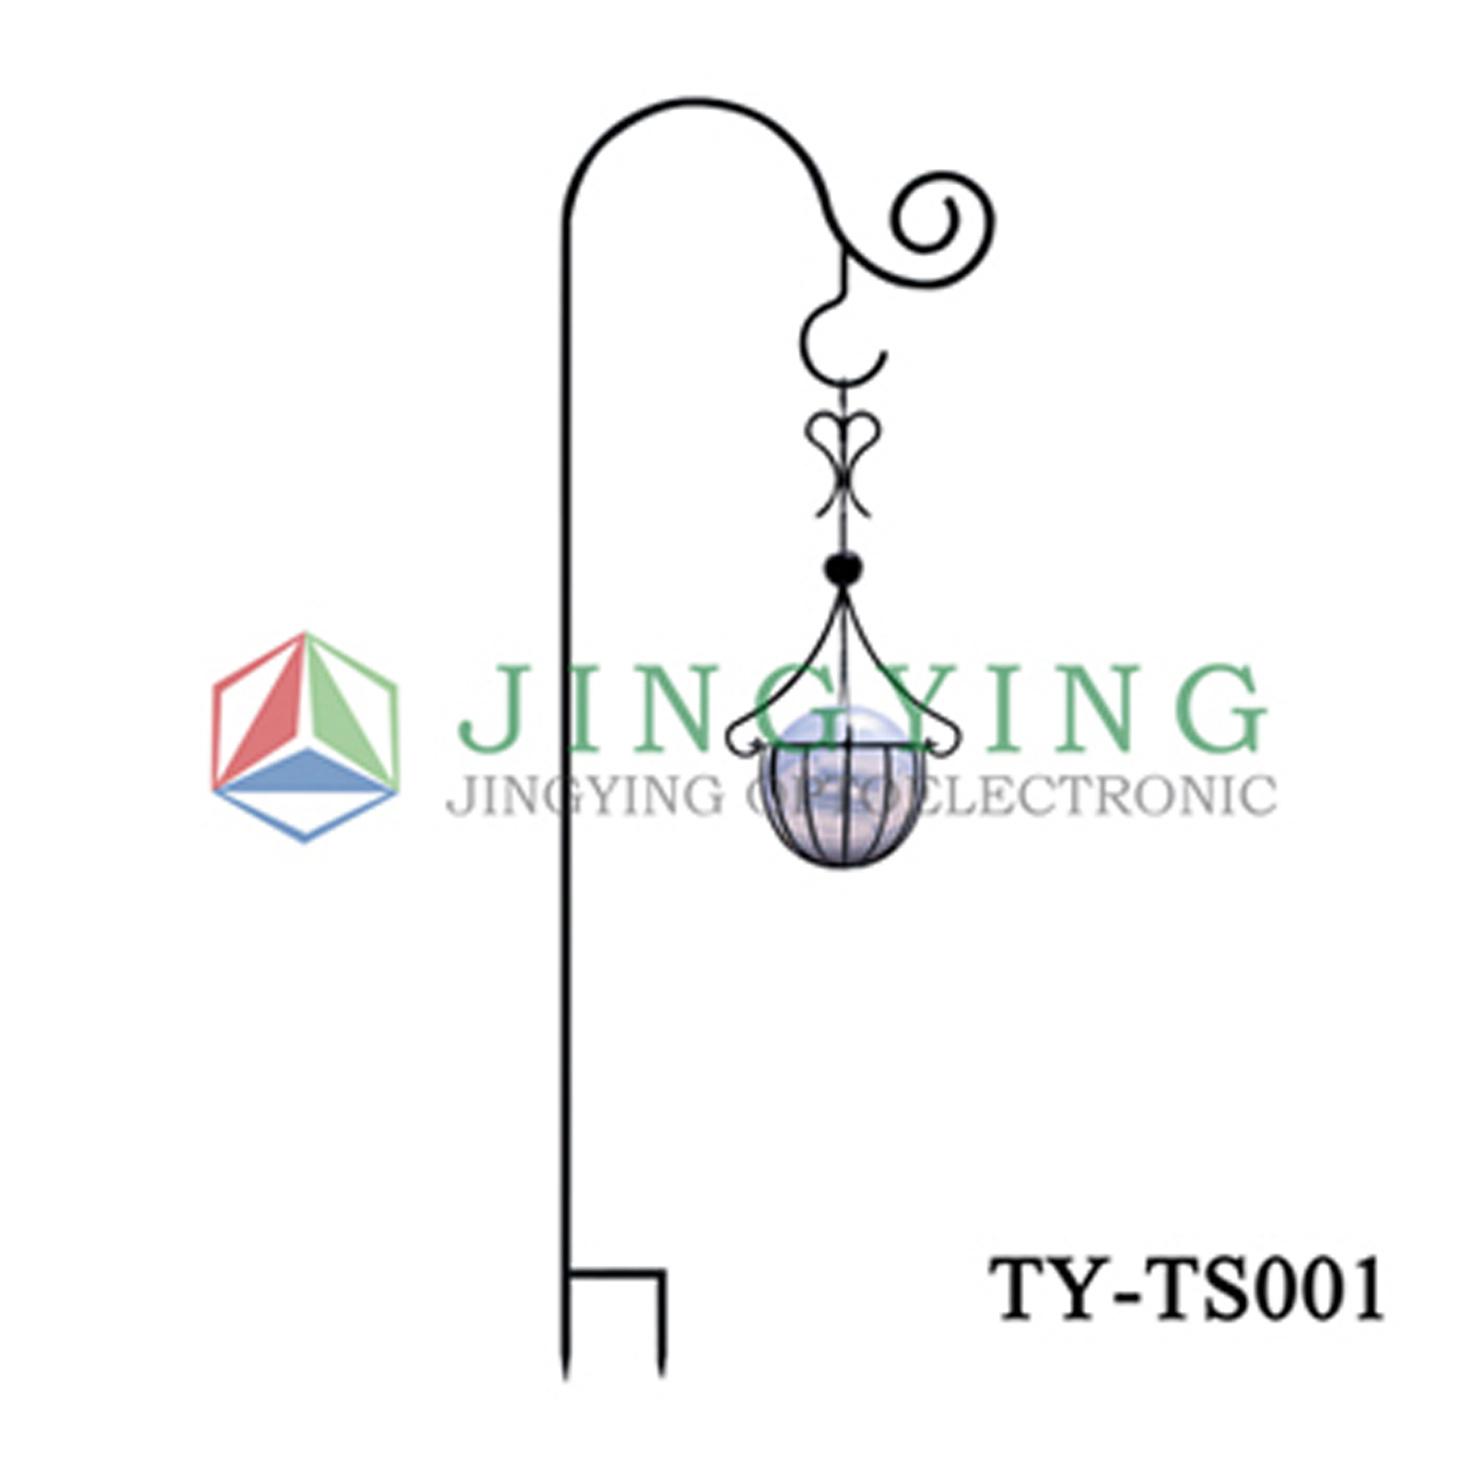 solar stick light  ty-ts001